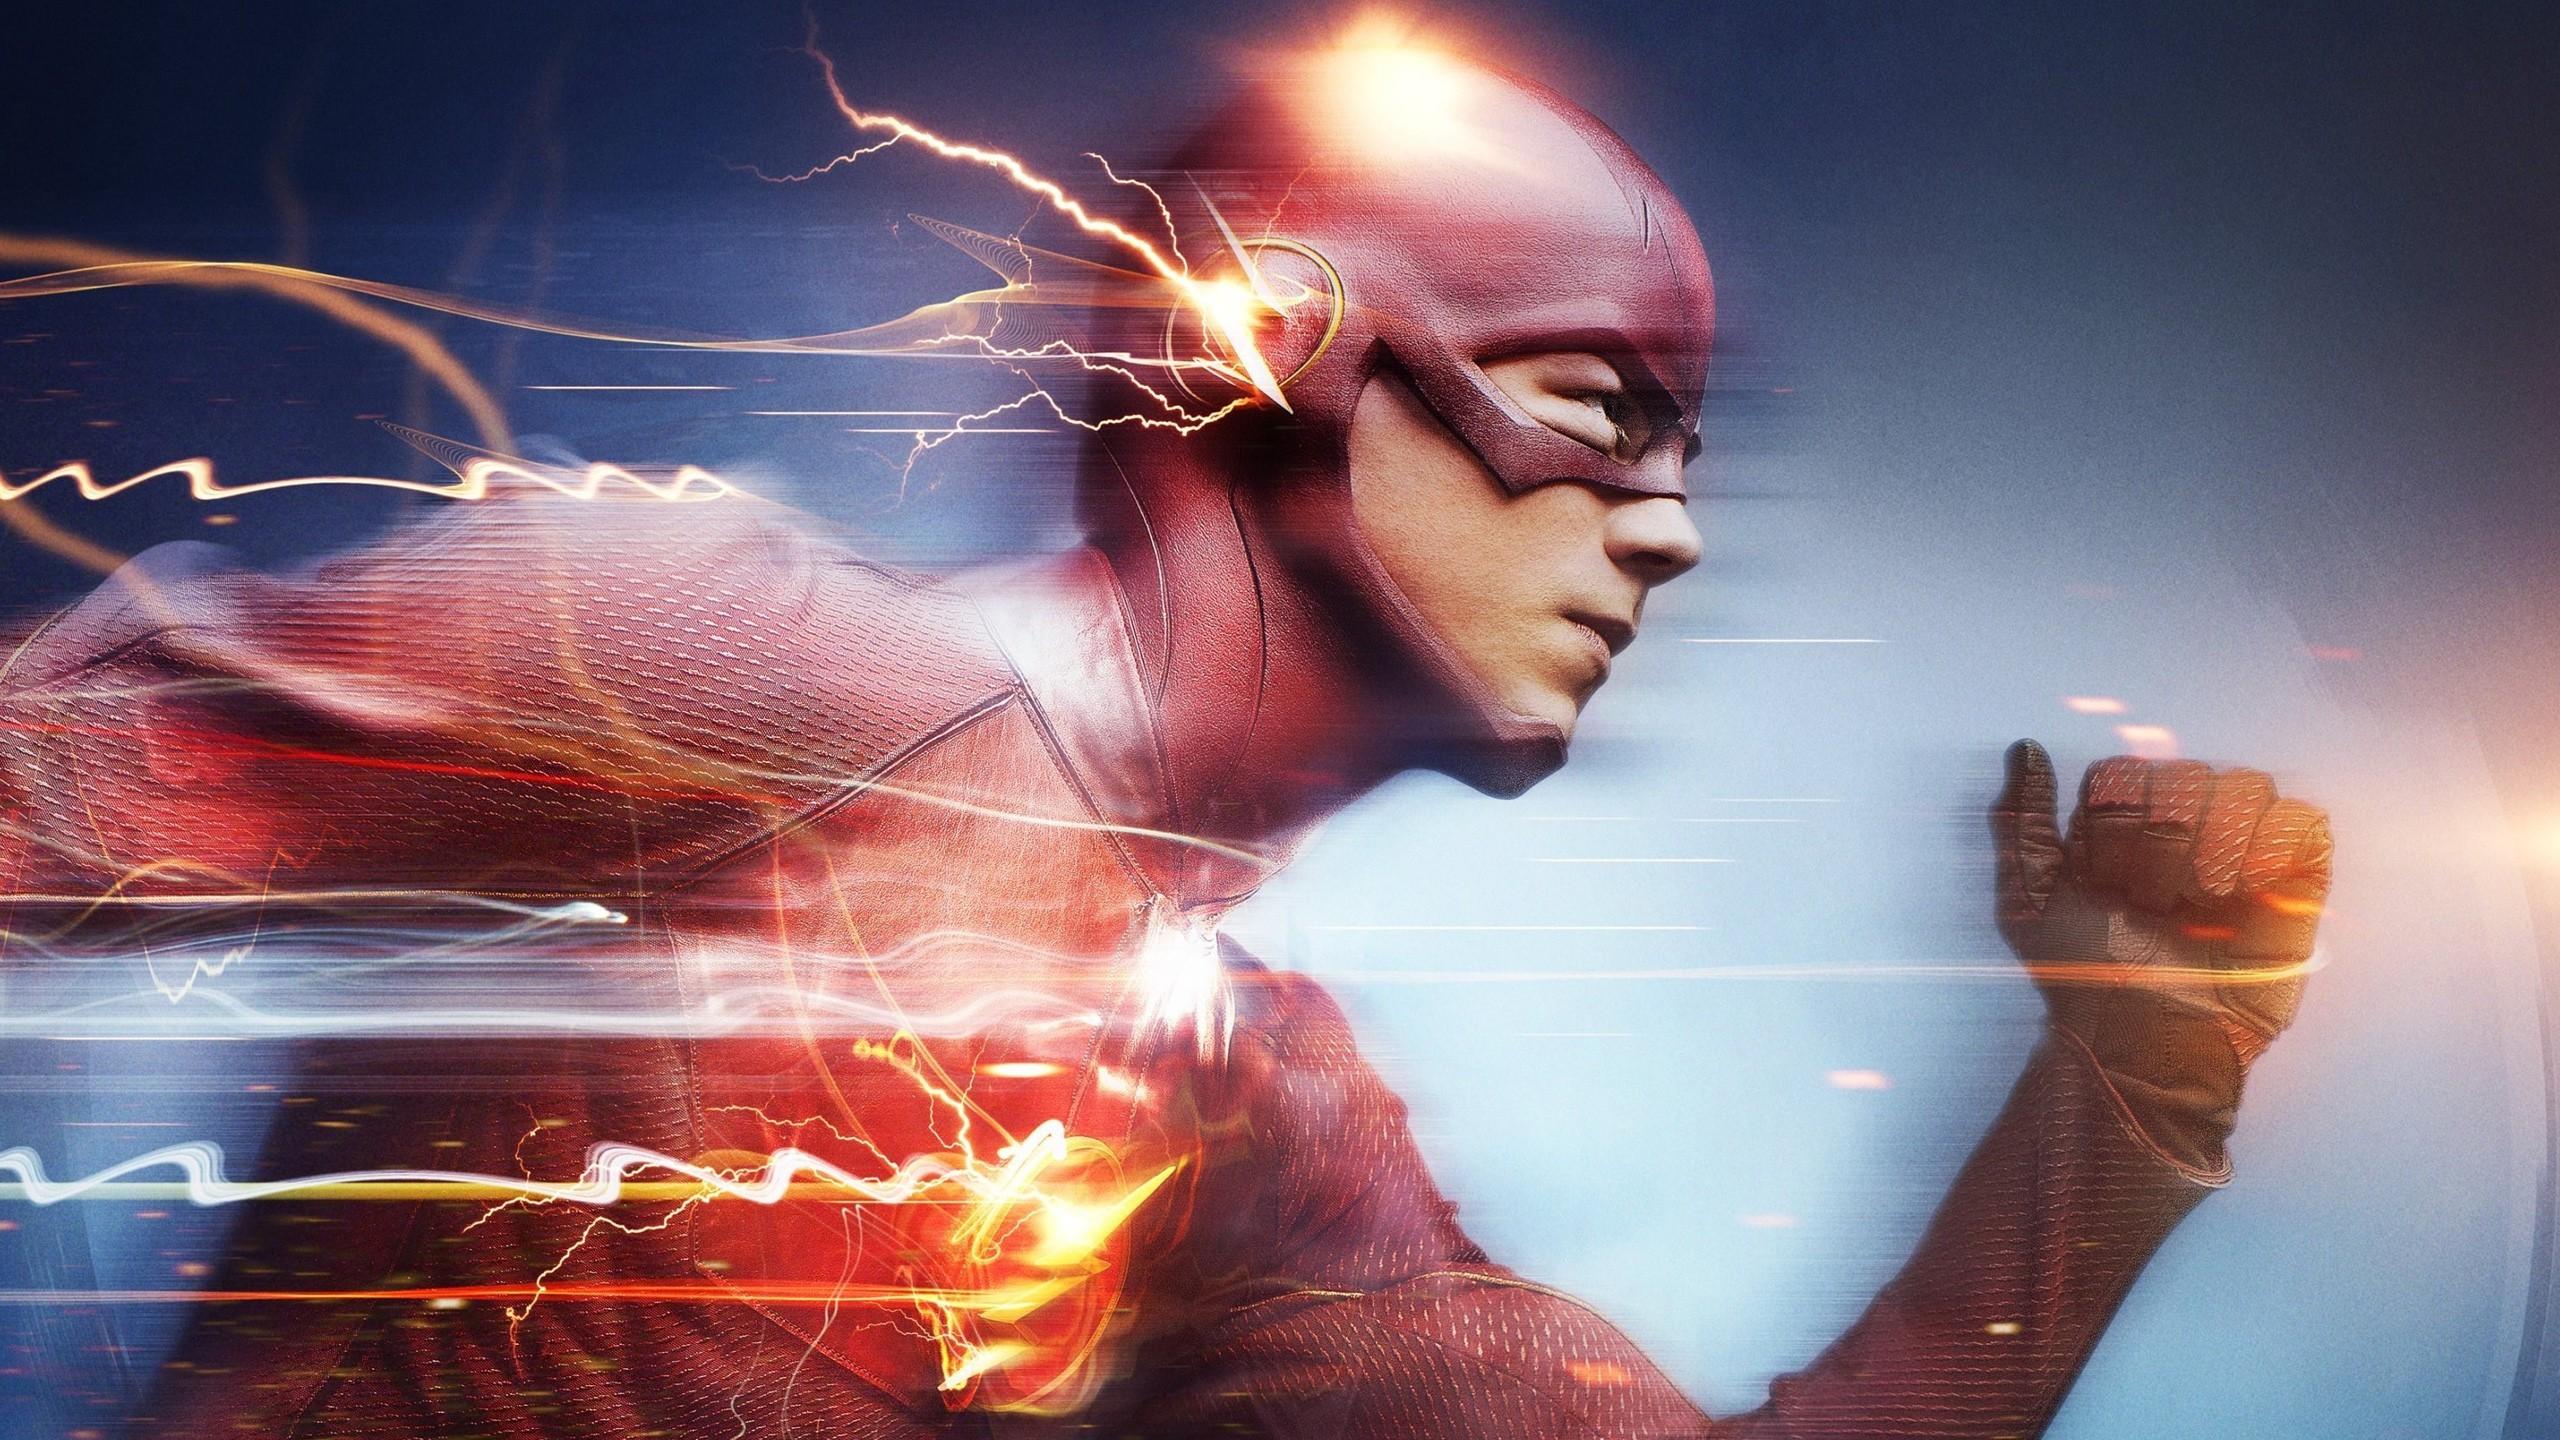 … x 1440 Original. Description: Download Barry Allen The Flash TV Series  wallpaper …